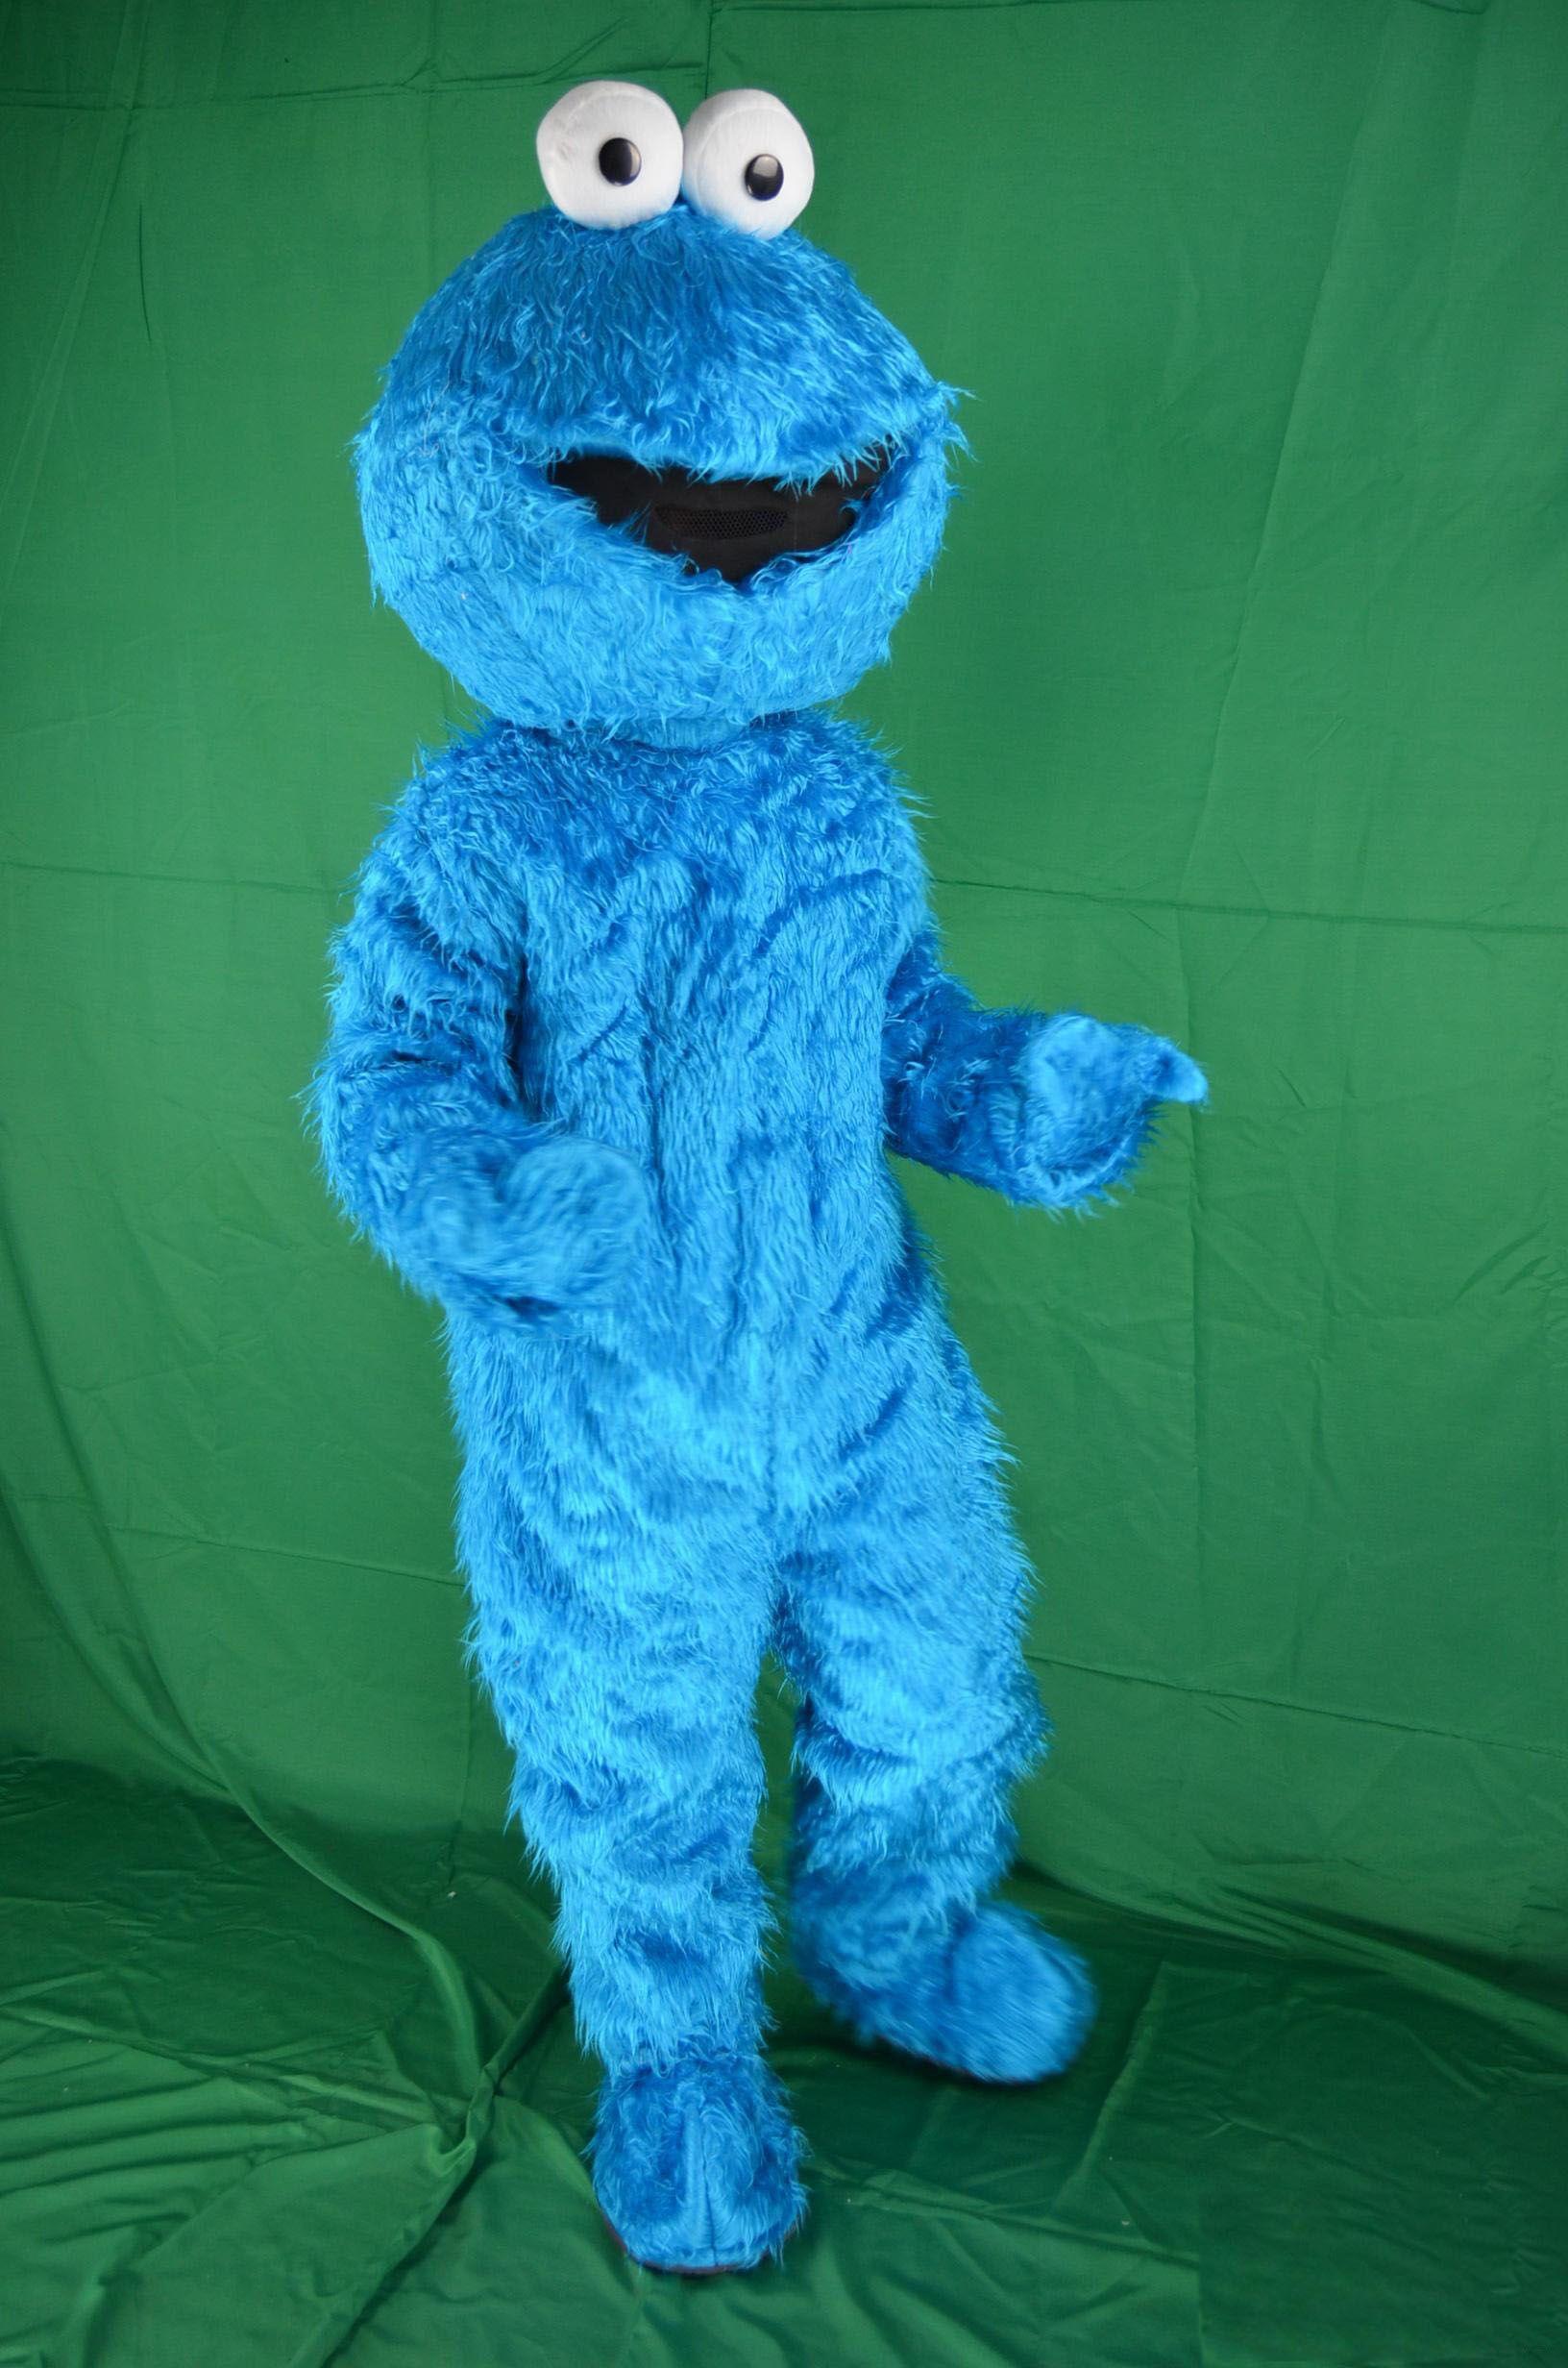 2018 hot sale sesame street blue cookie monster mascot costume